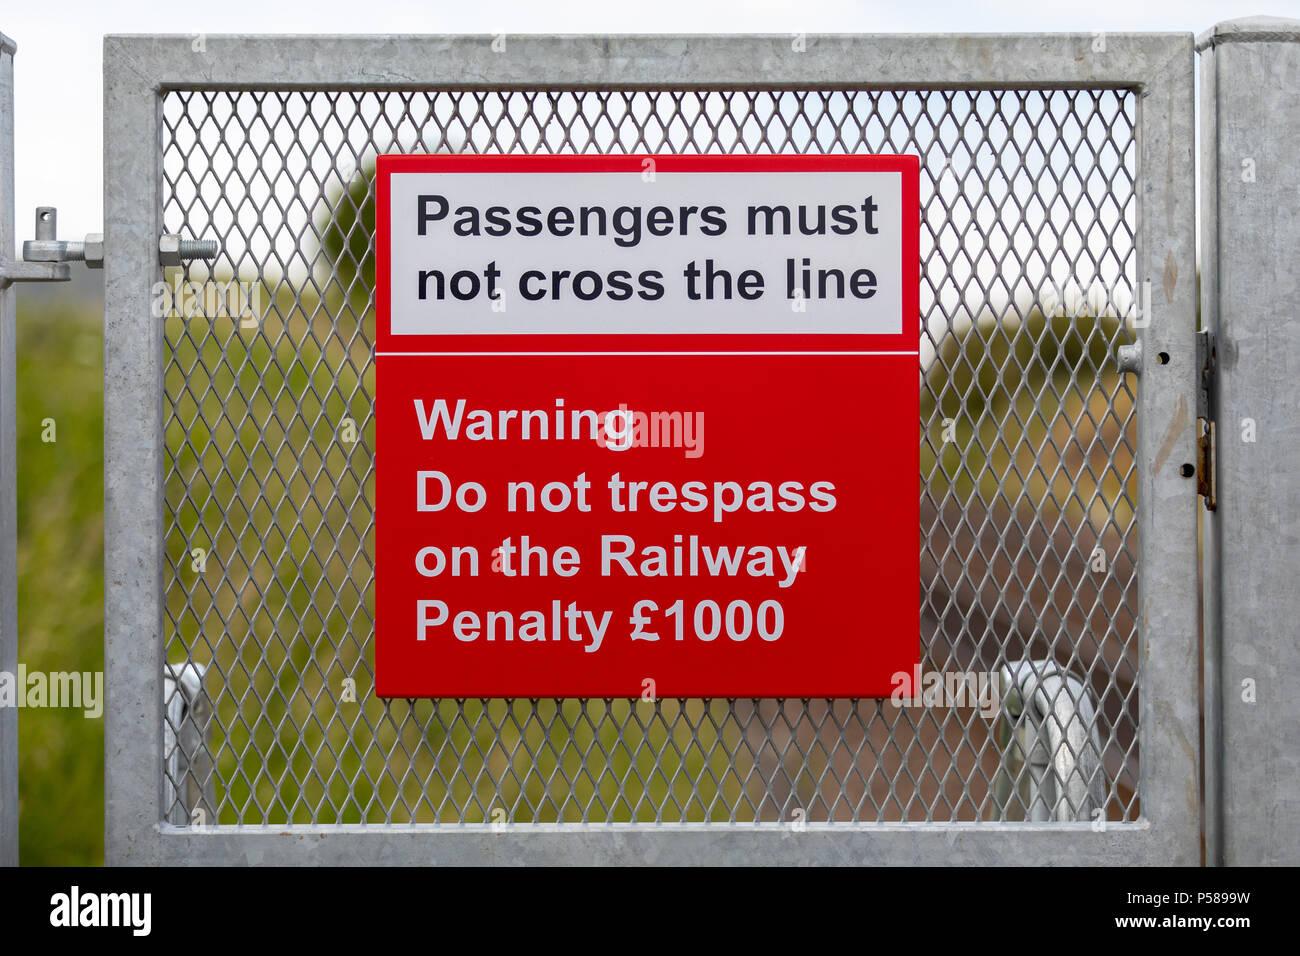 Passengers must not cross the line railway warning sign - Stock Image